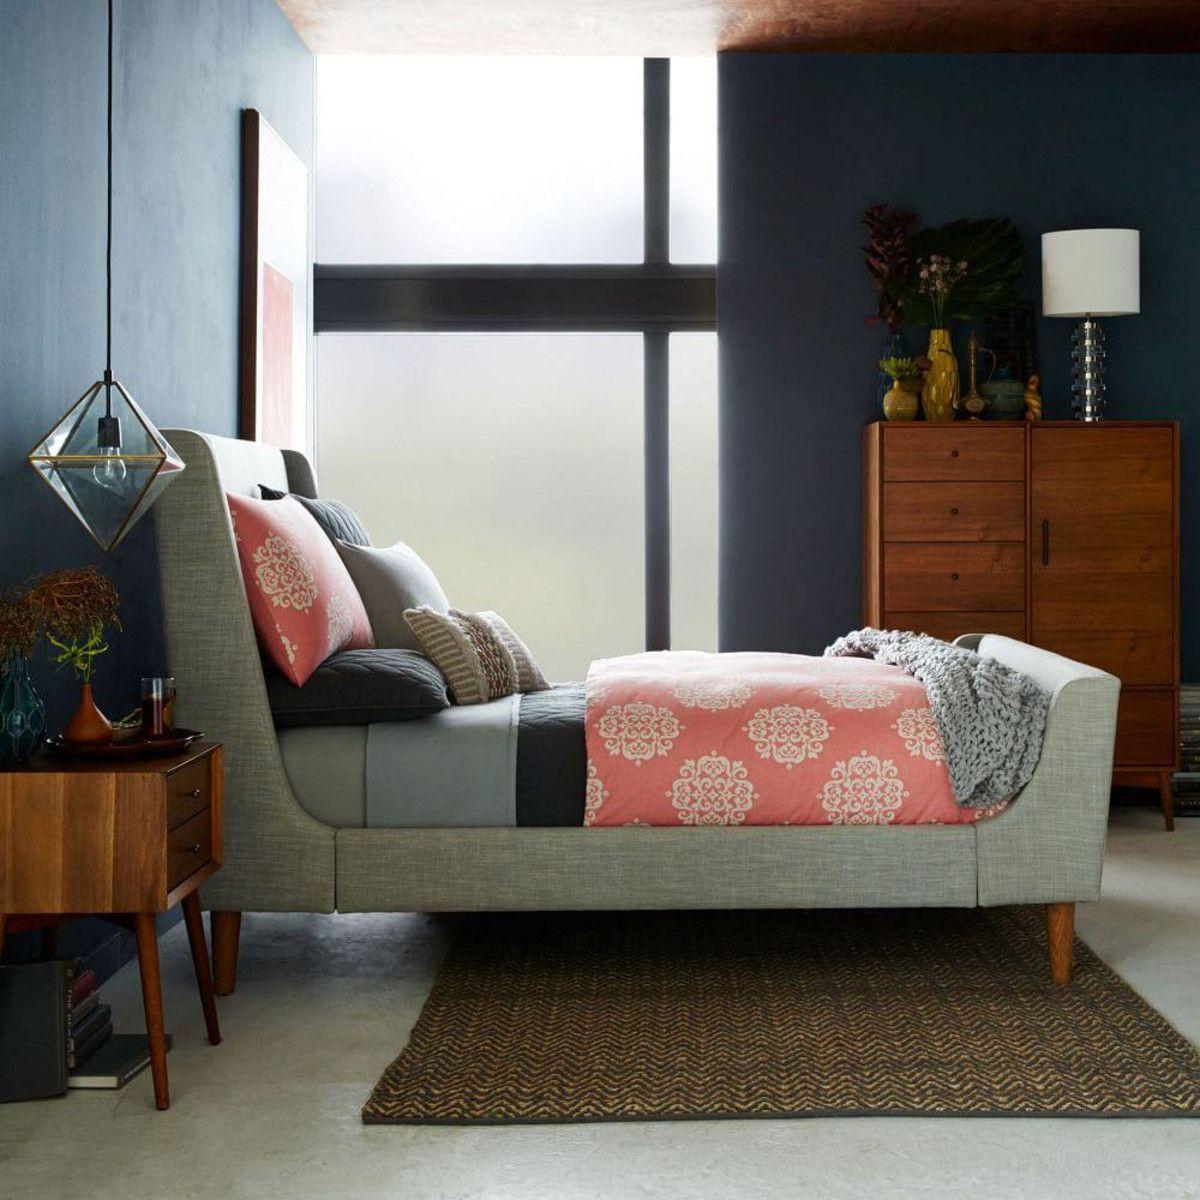 Upholstered Sleigh Bed Upholstered sleigh bed, Bed